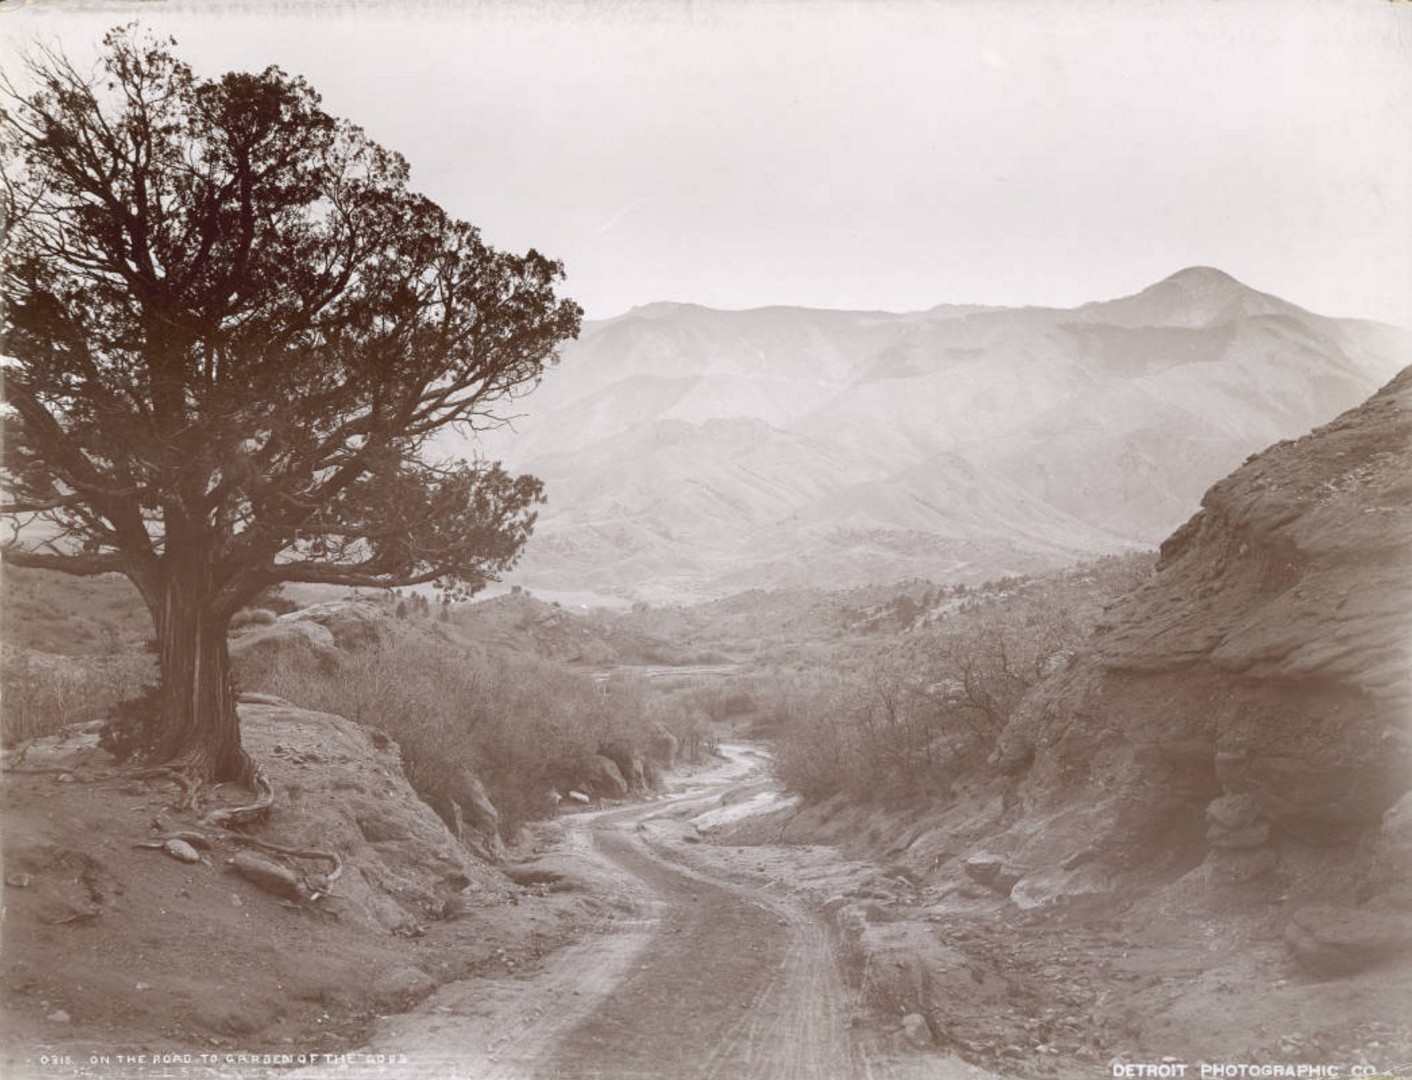 Image titleOn the road to Garden of the Gods,W.H. Jackson sample album. Colorado Book VII, no. 76, Denver Public Library